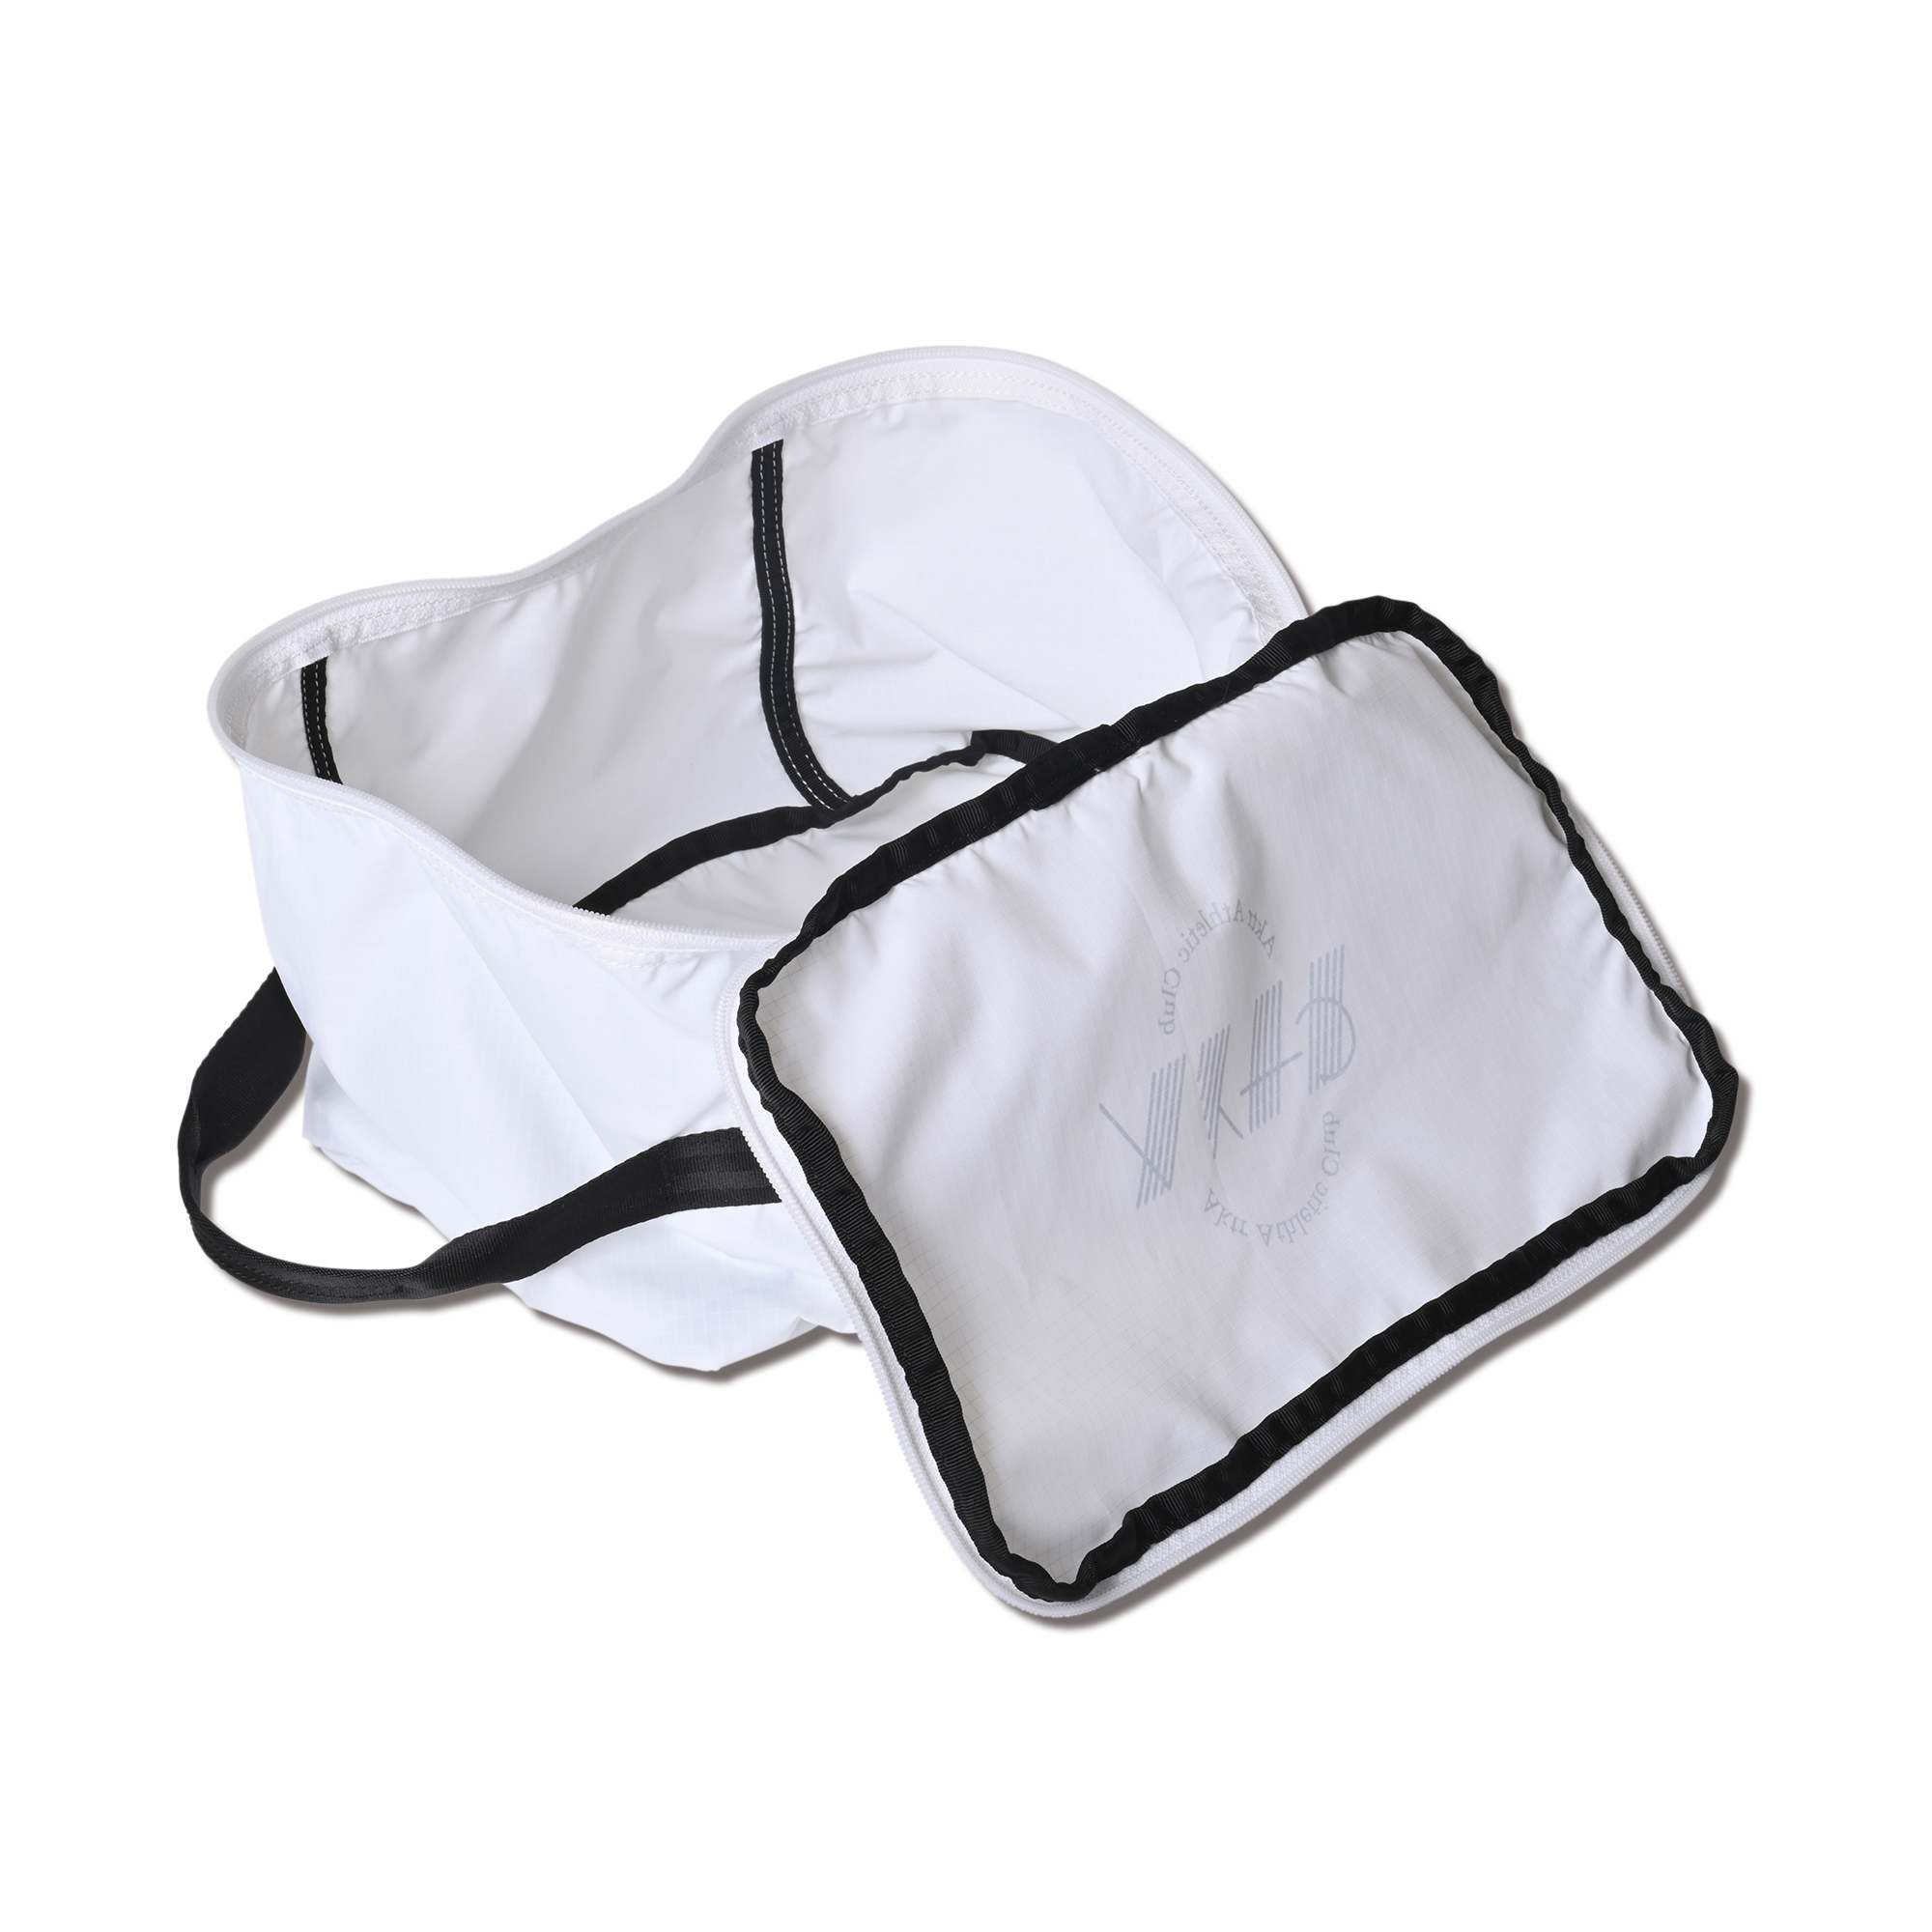 AKTR AAC SQUARE BAG WHITE